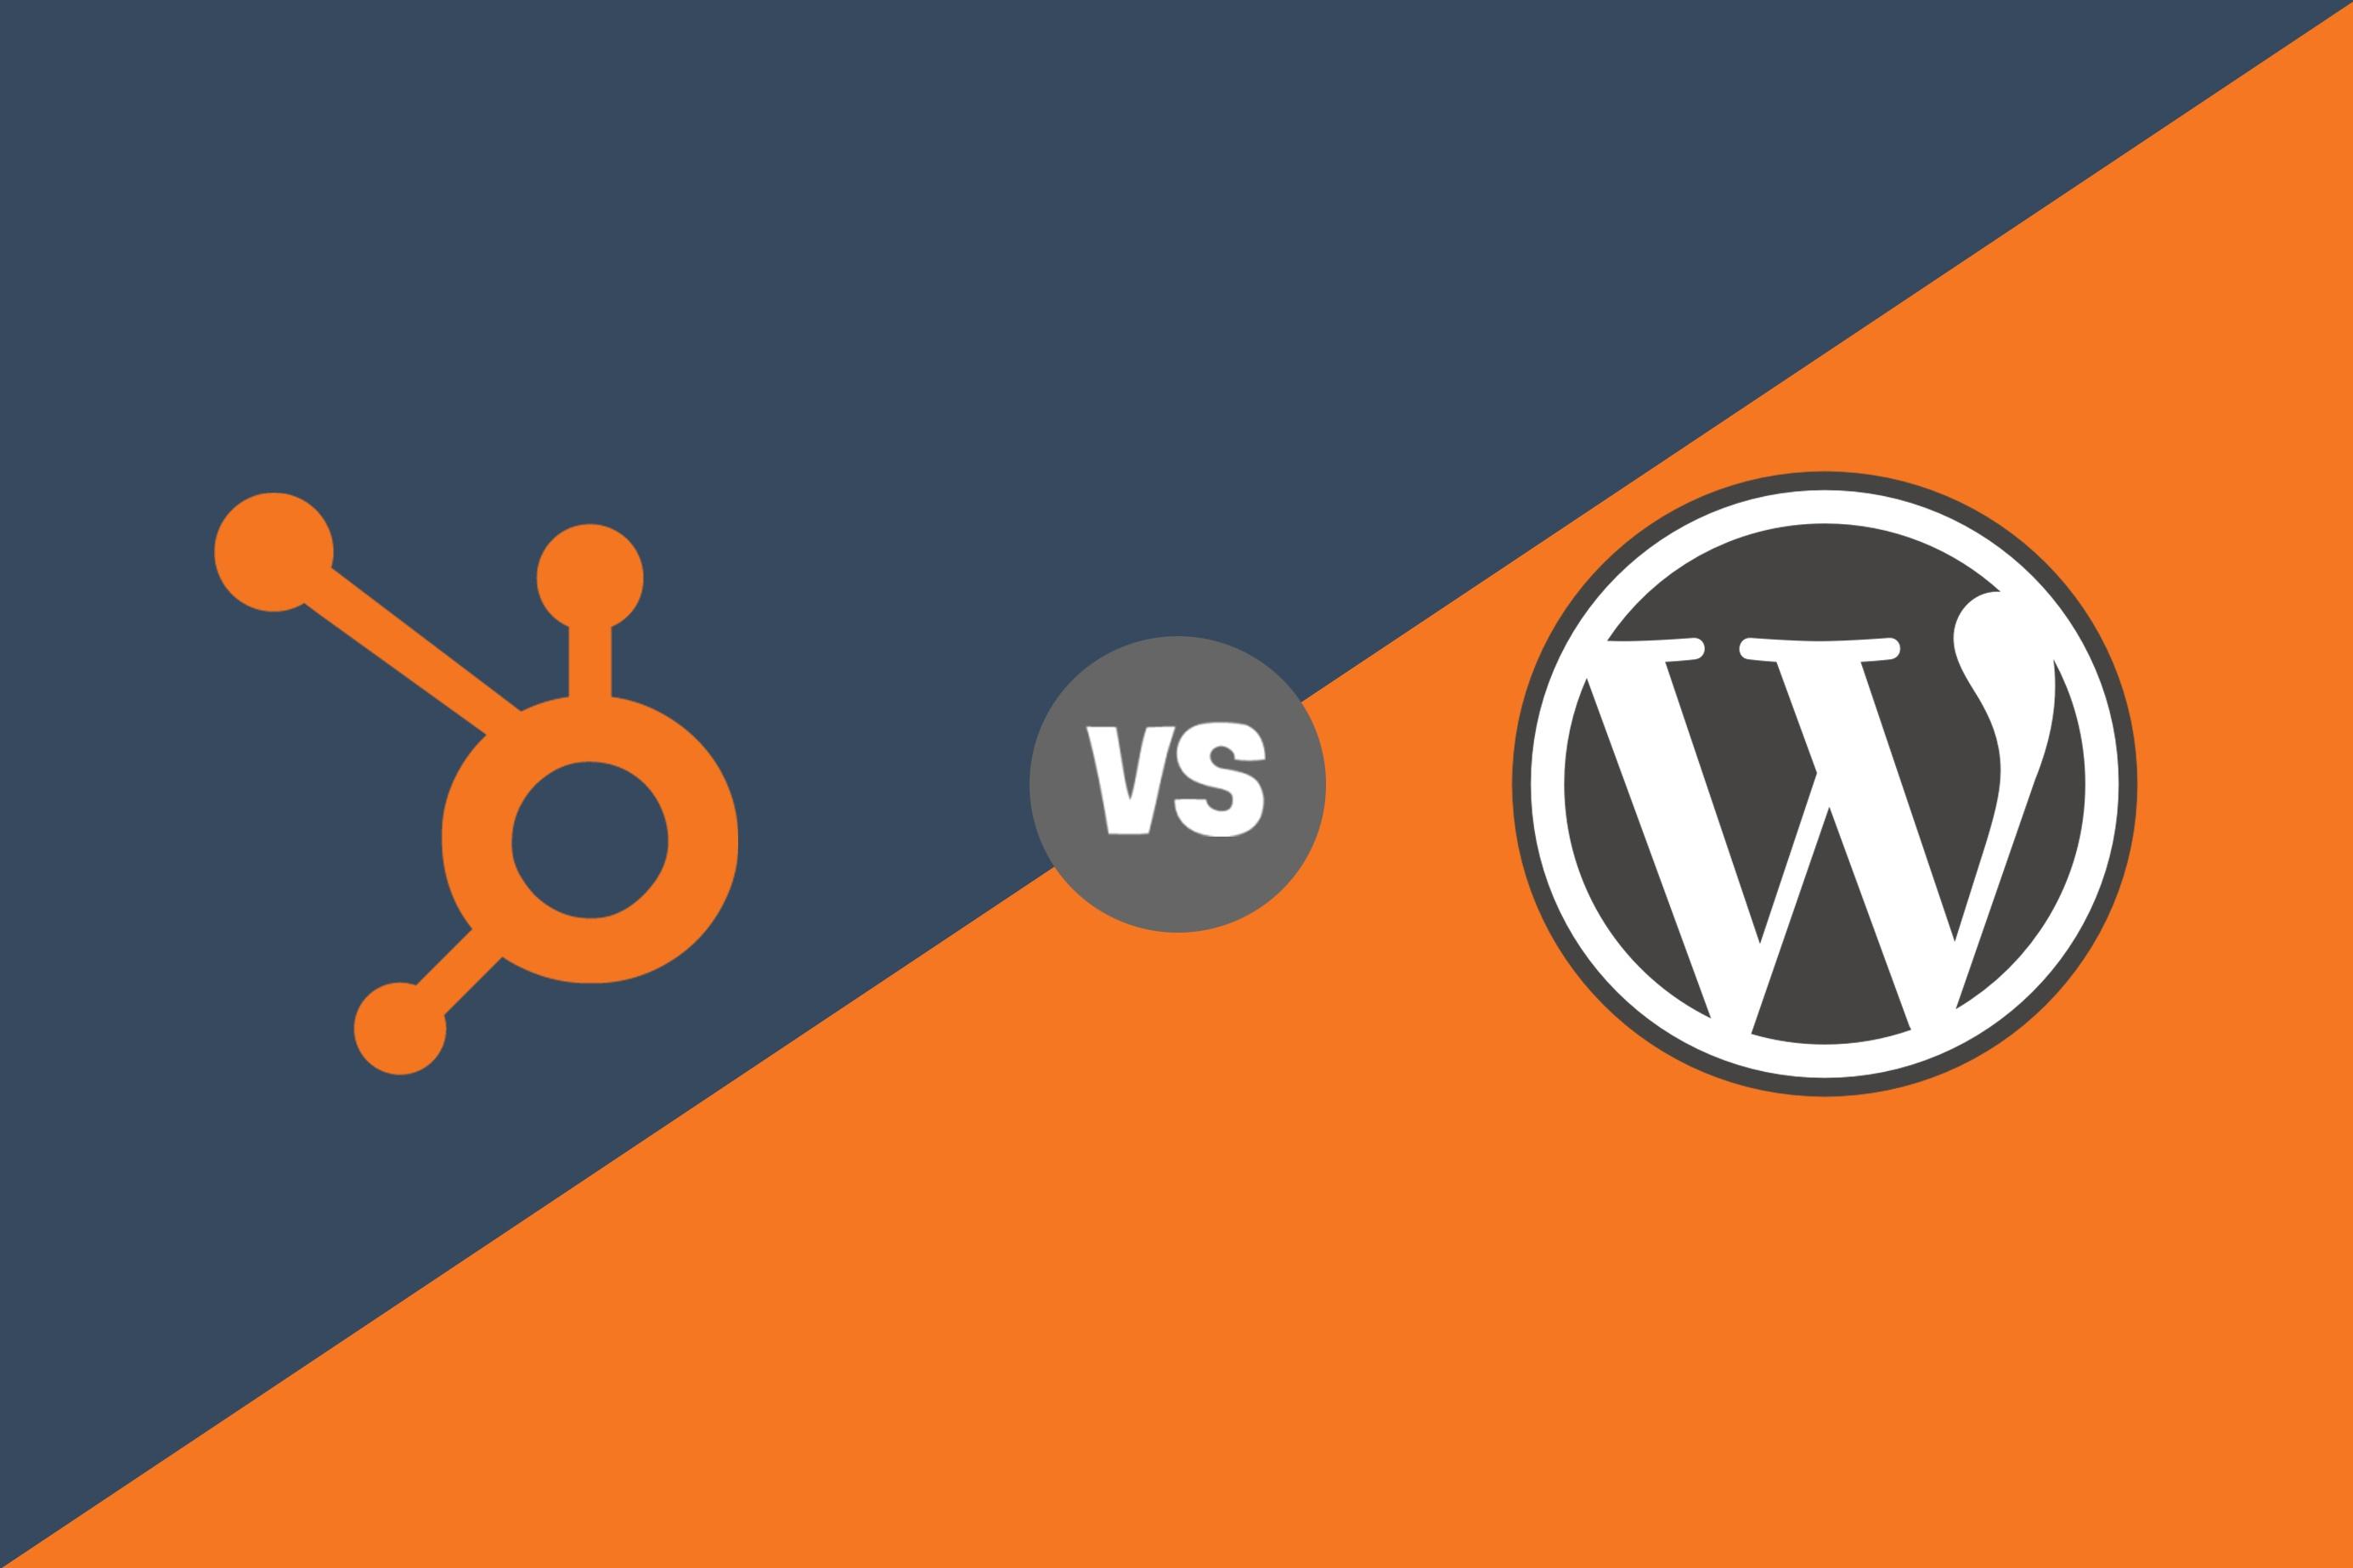 hubspot cos vs wordpress cms